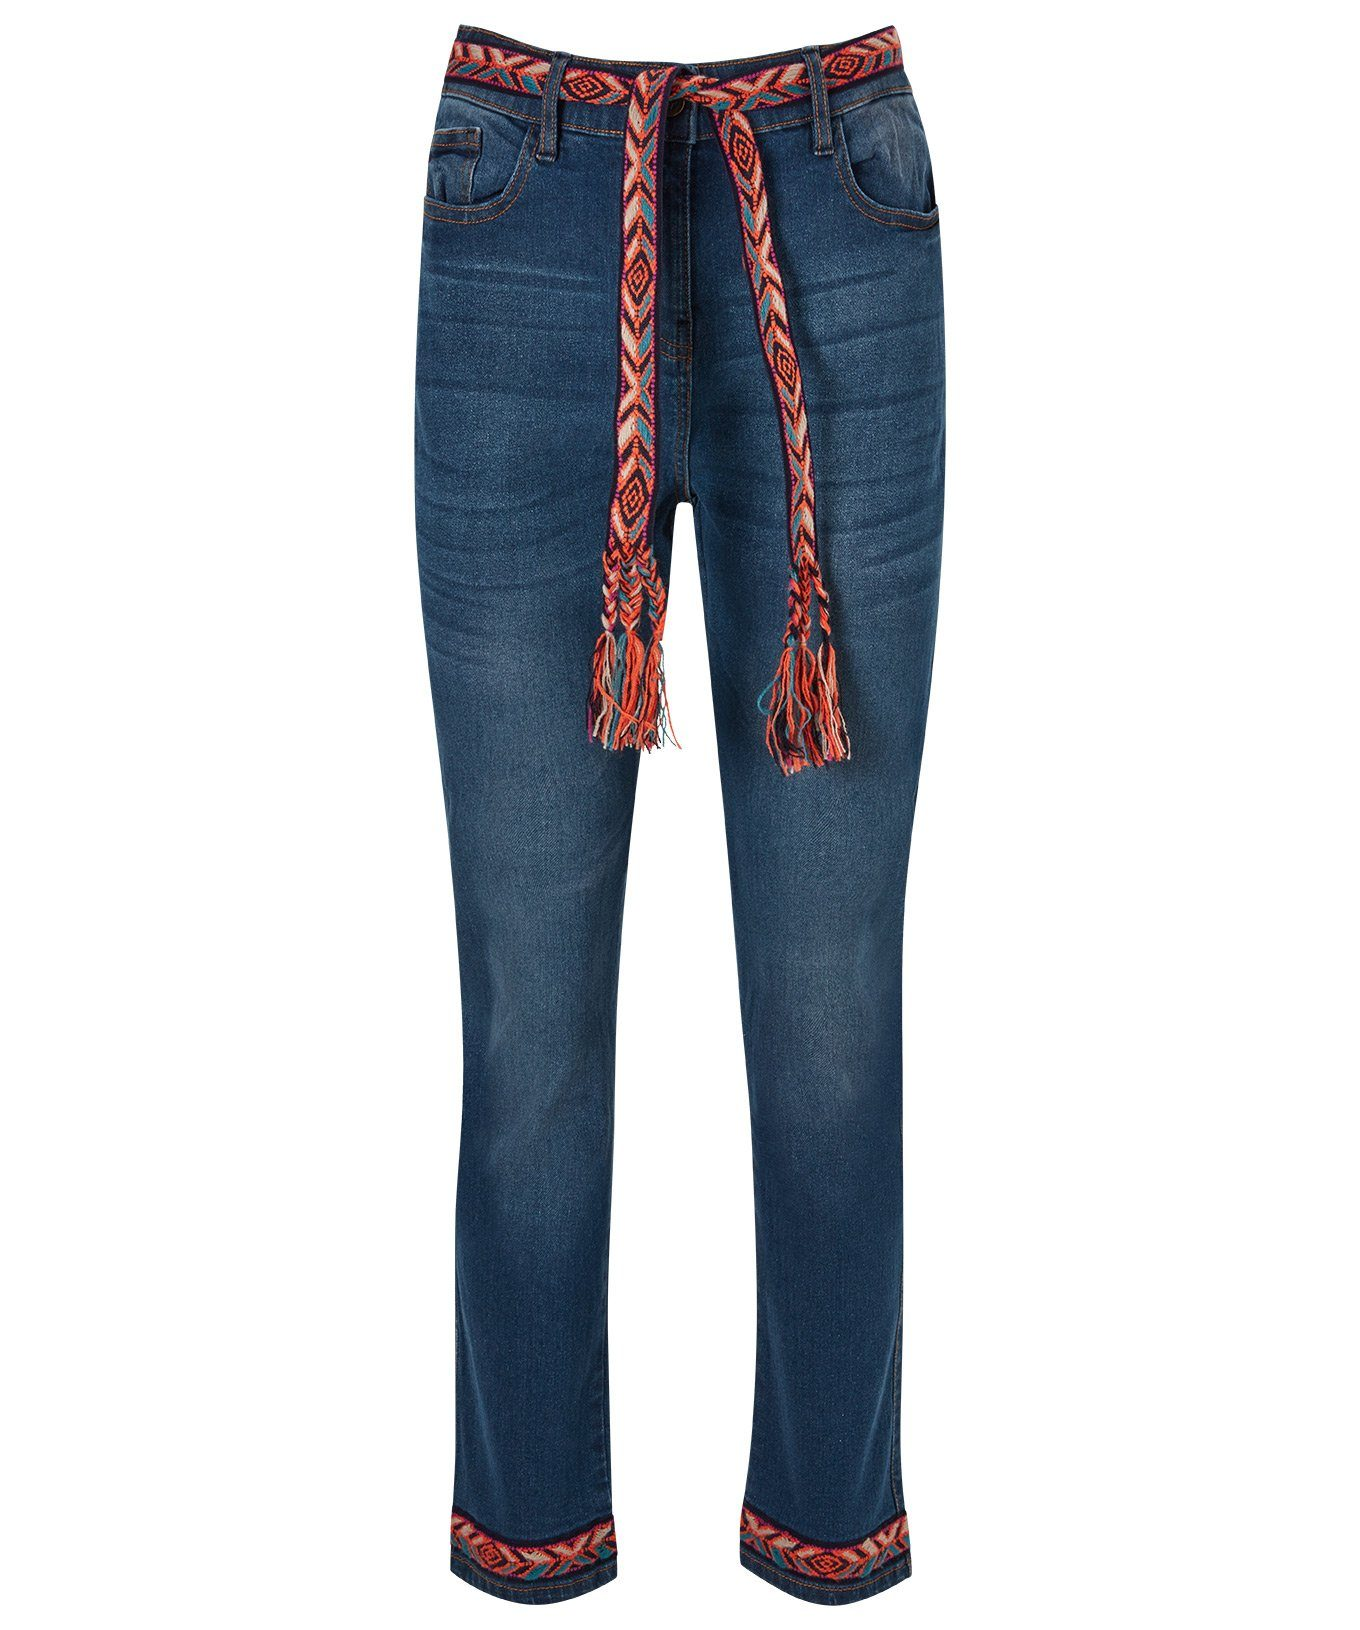 Joe Browns Regular-fit-Jeans »Knöchelhose mit Flechtgürtel«